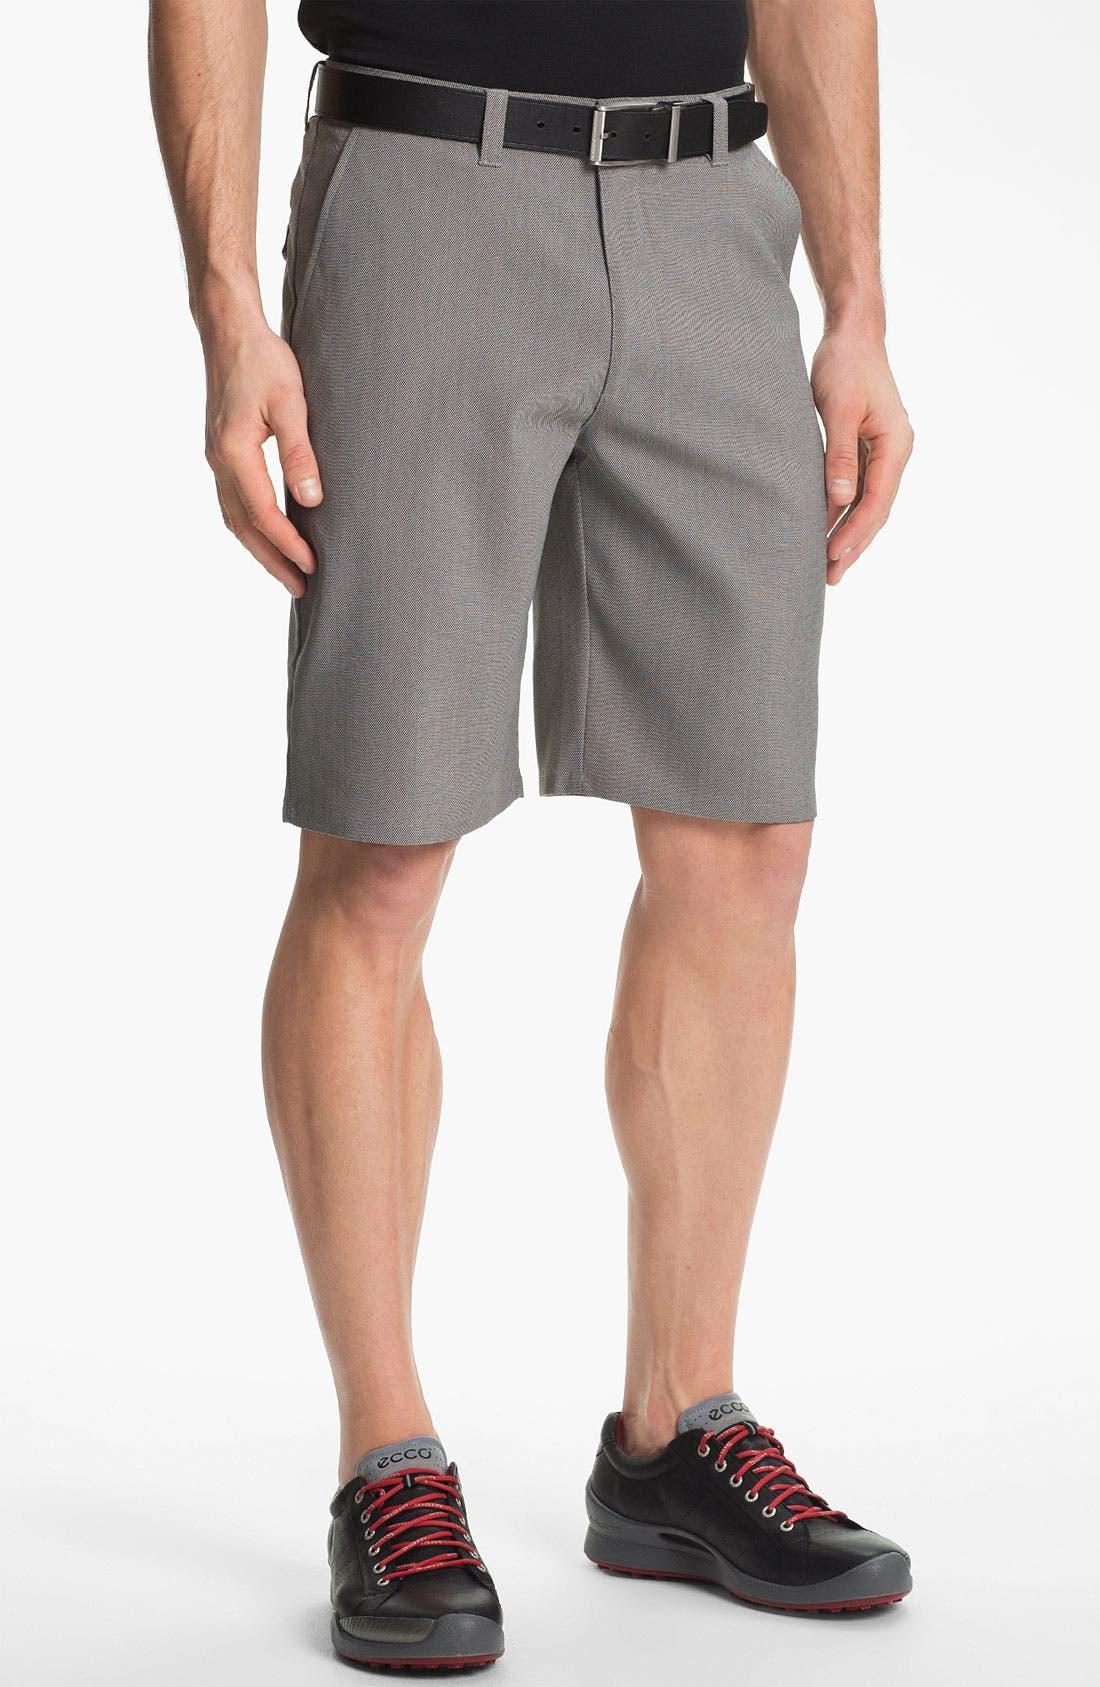 Alternate Image 1 Selected - Travis Mathew 'Pwizzle' Golf Shorts